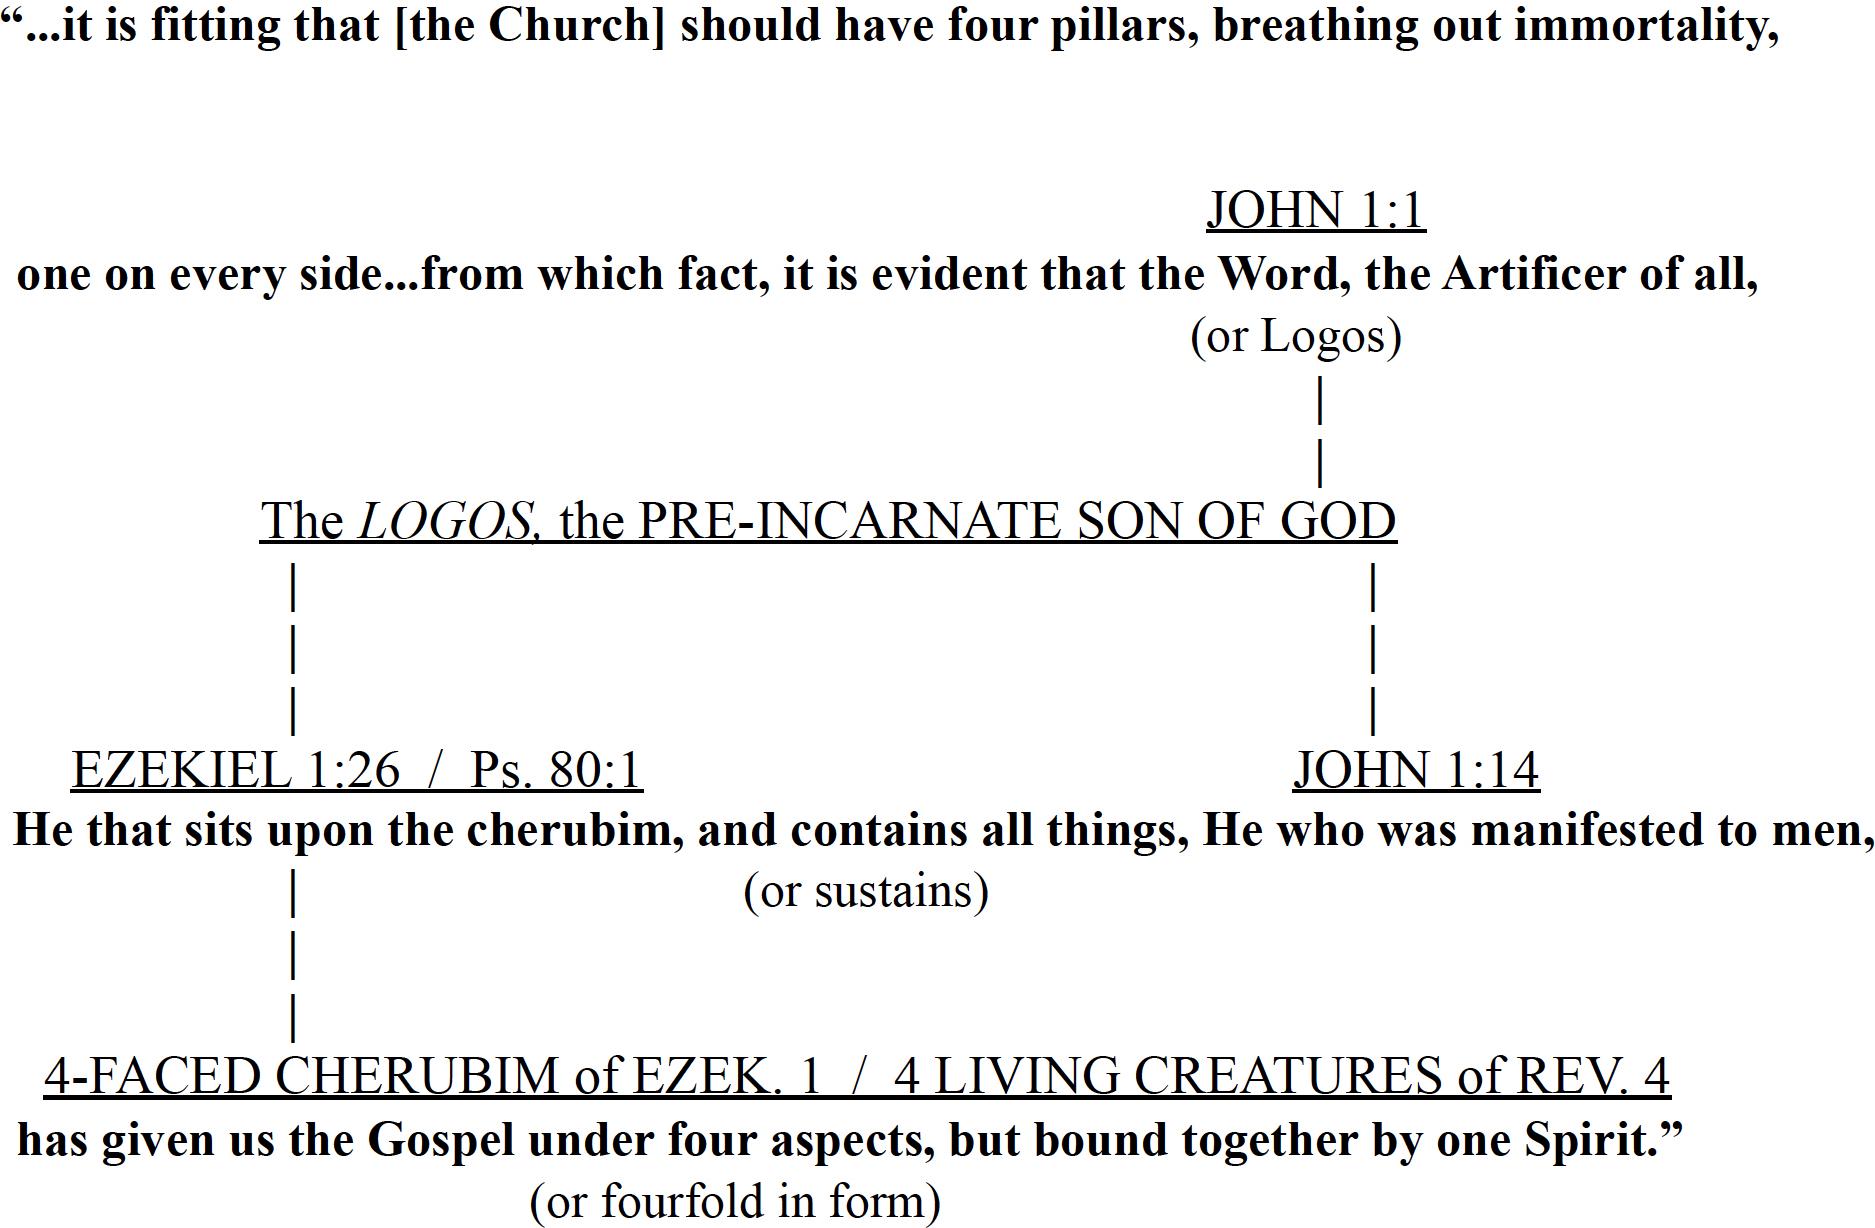 FIGURE A-2:   Irenaeus' Linkage of the Four Gospels to Ezekiel's Chariot